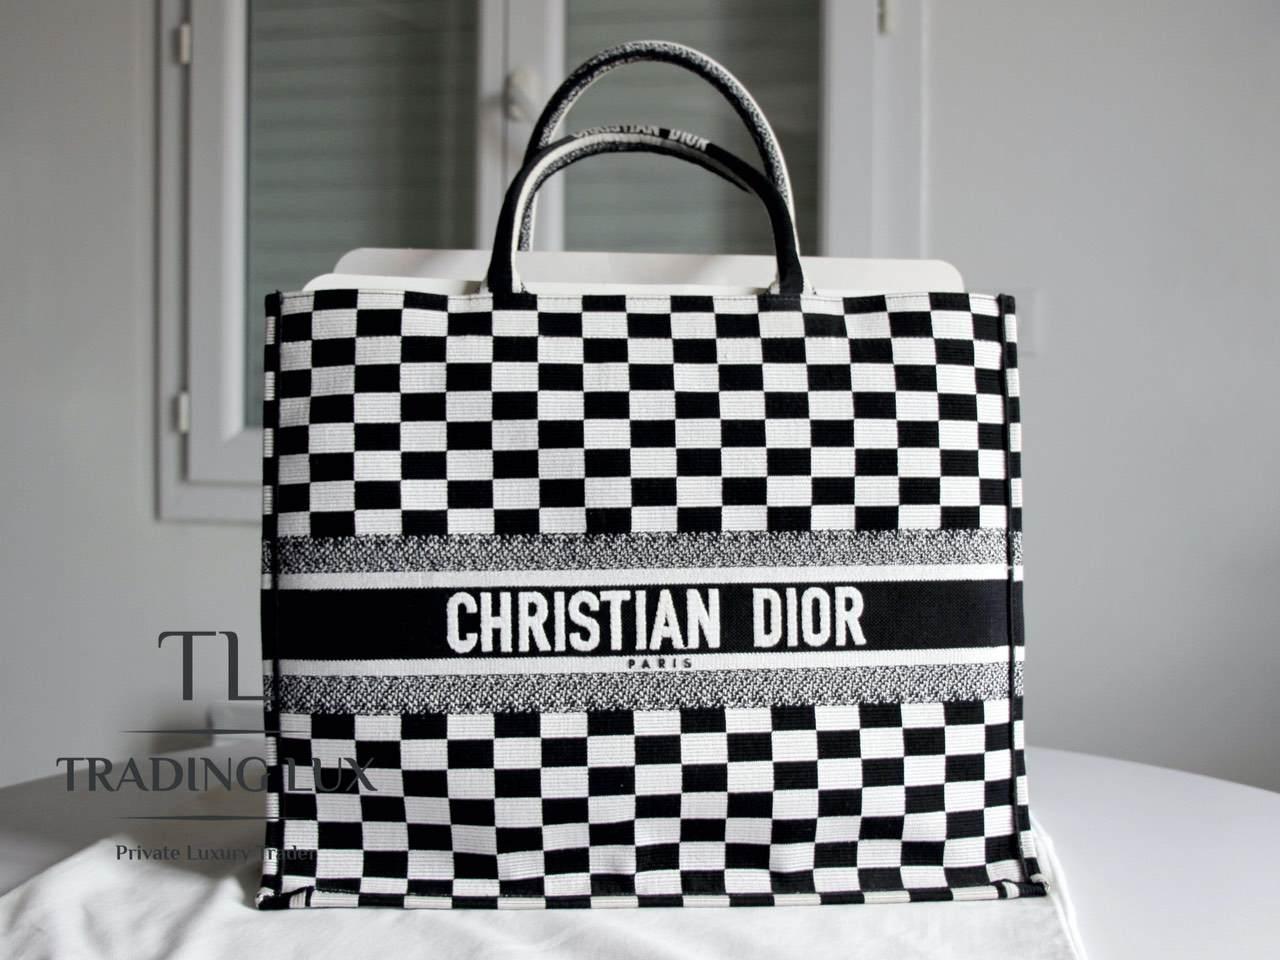 Dior-Book-Tote-Limited-Edition-0